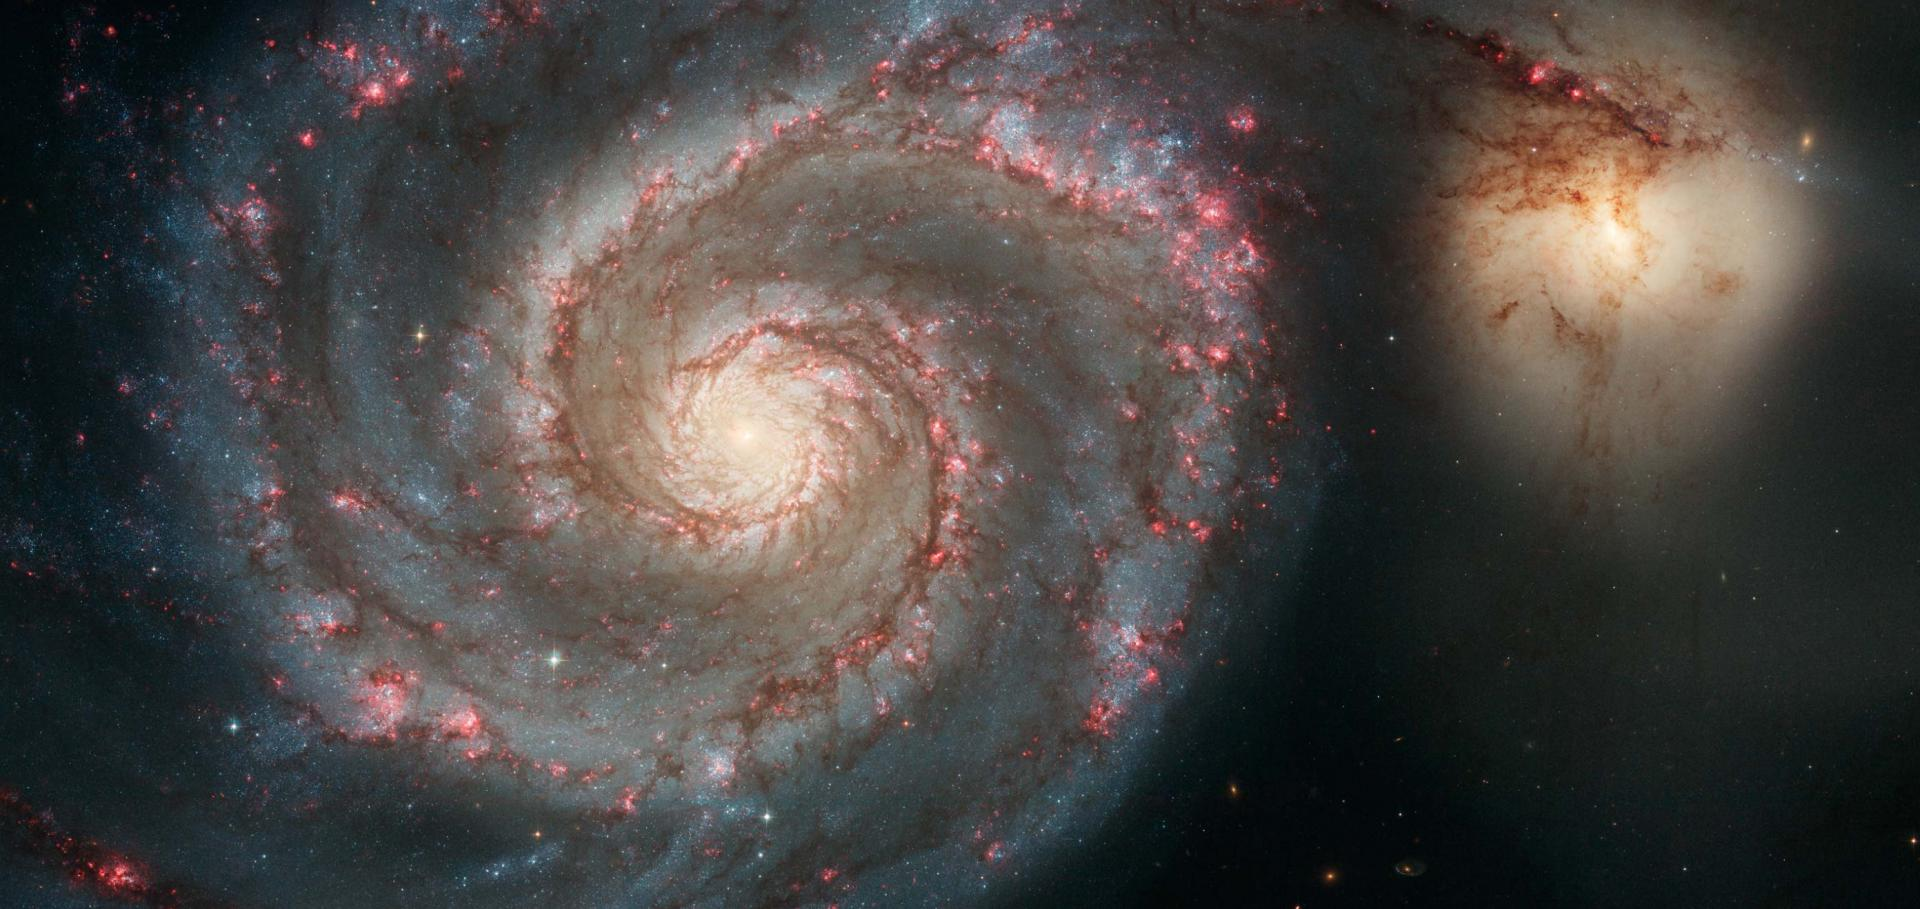 The Whirlpool Galaxy M51